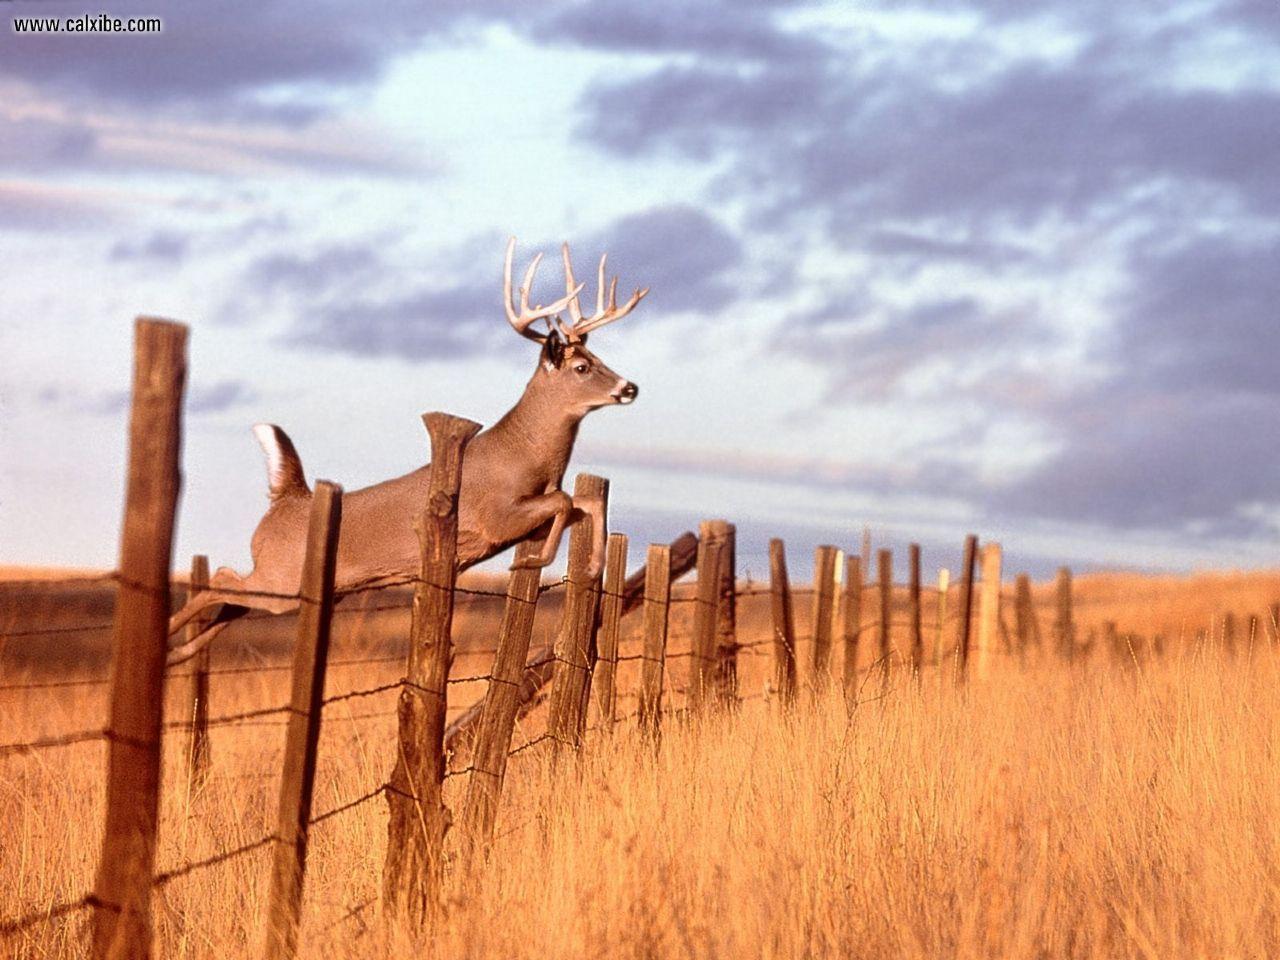 Deer Hunting Wallpapers For Computer Wallpaper 1920×1200